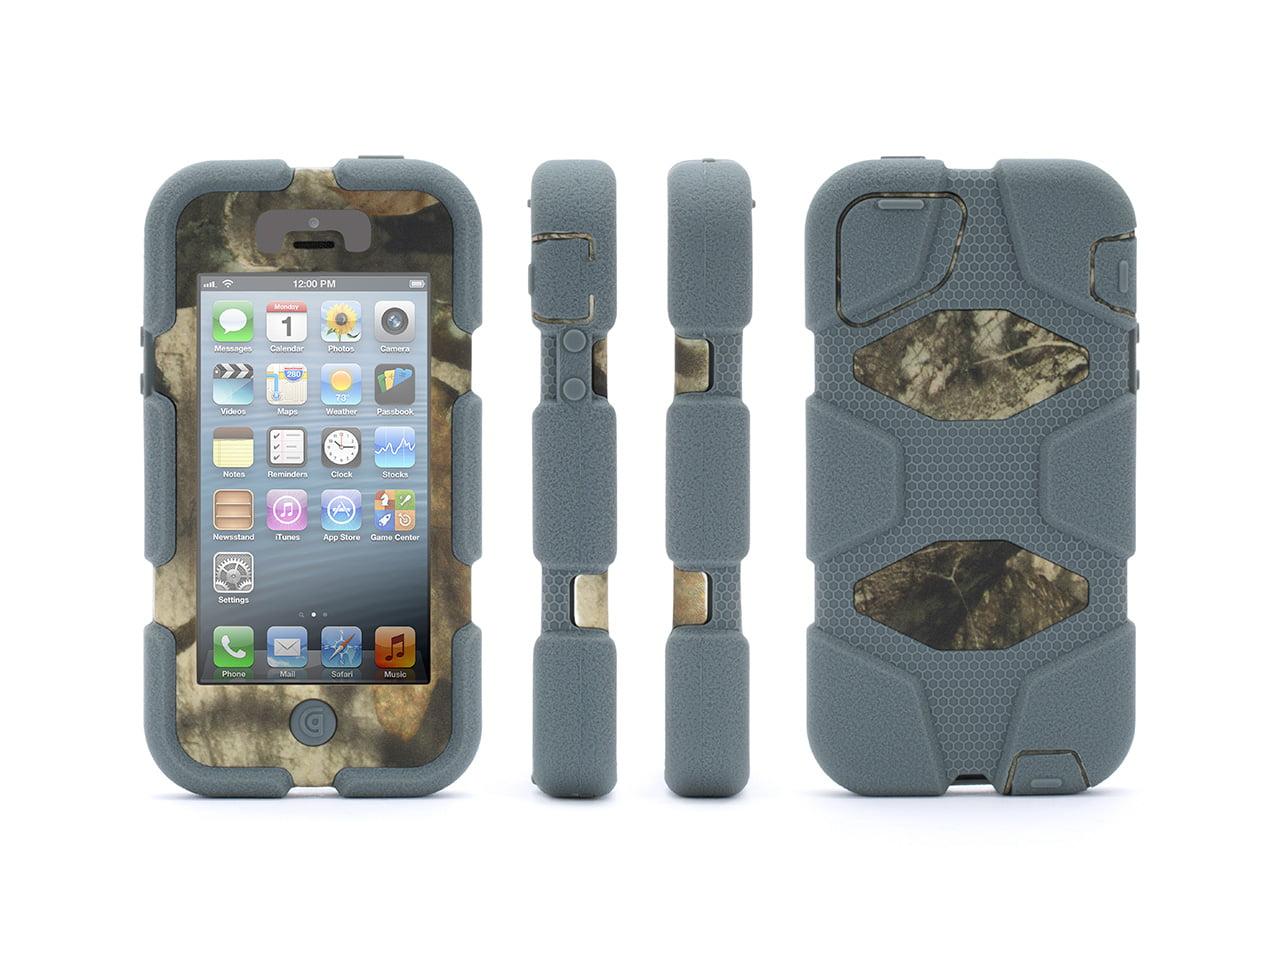 Griffin IPhone 5/5s, IPhone SE Rugged Case, Survivor All Terrain Mossy Oak  Camo, Heavy Duty Case In Mossy Oak Camo Direct From Griffin   Walmart.com